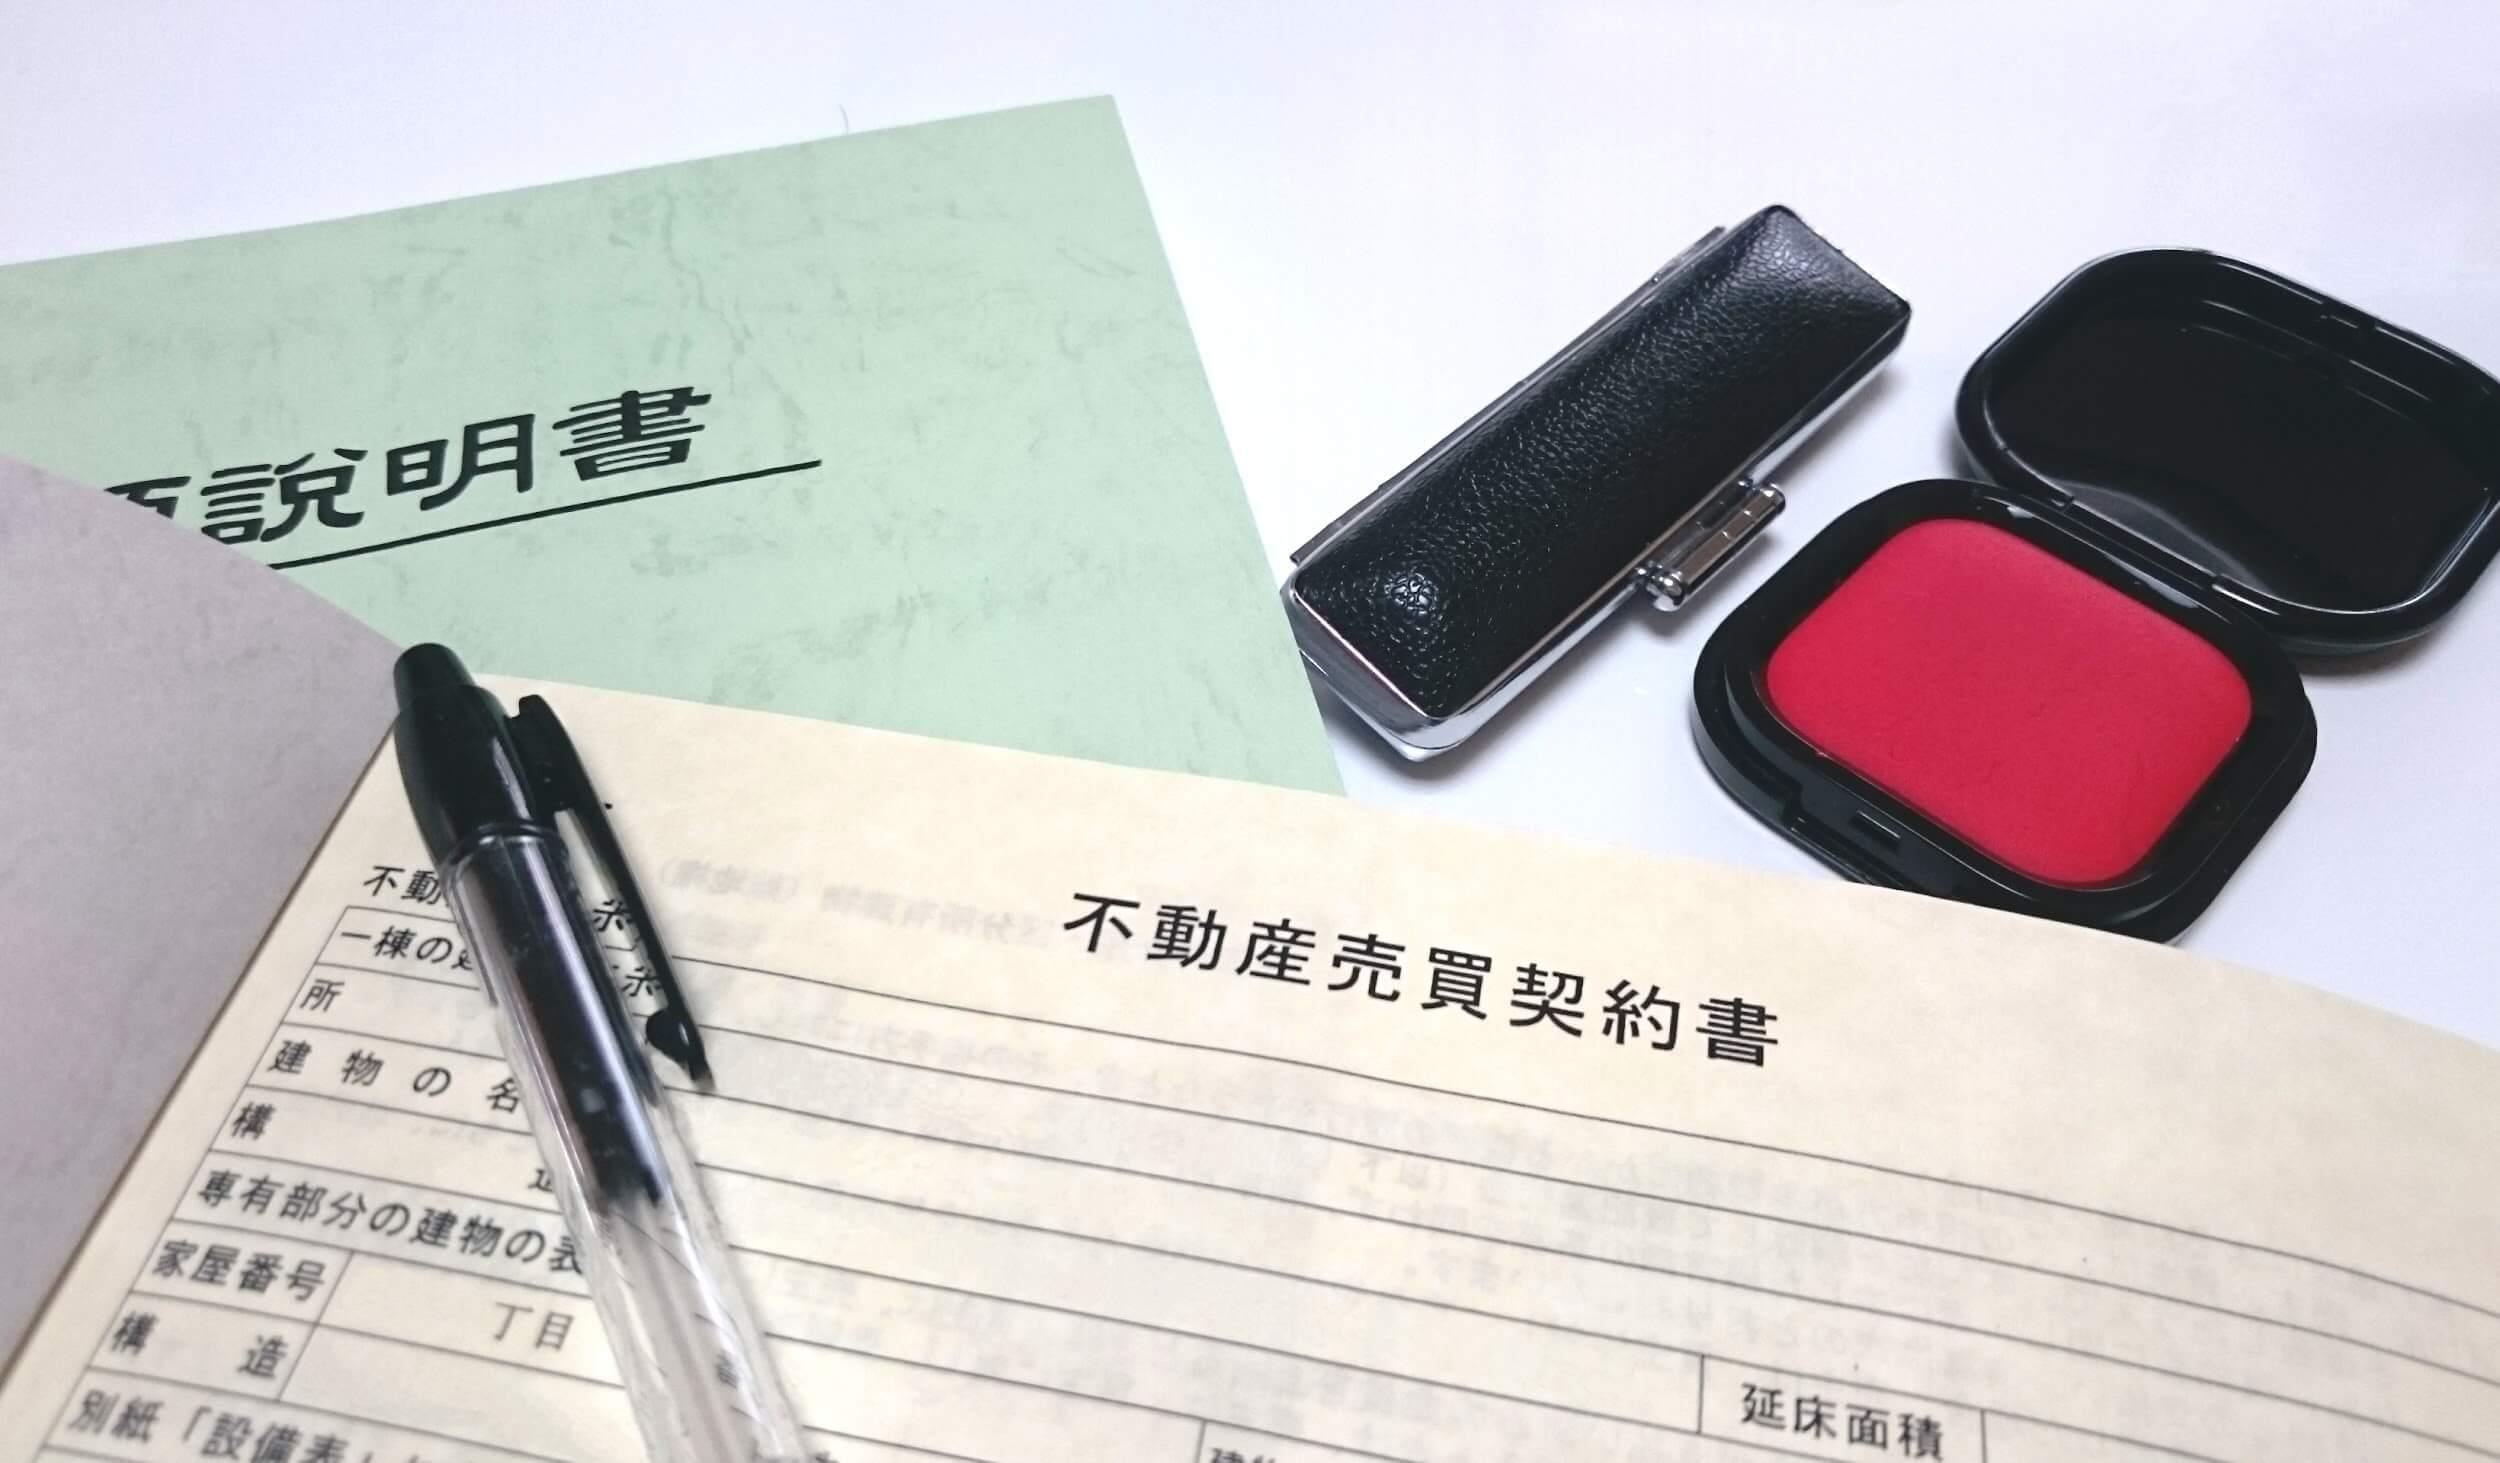 中古物件は契約時の特約確認